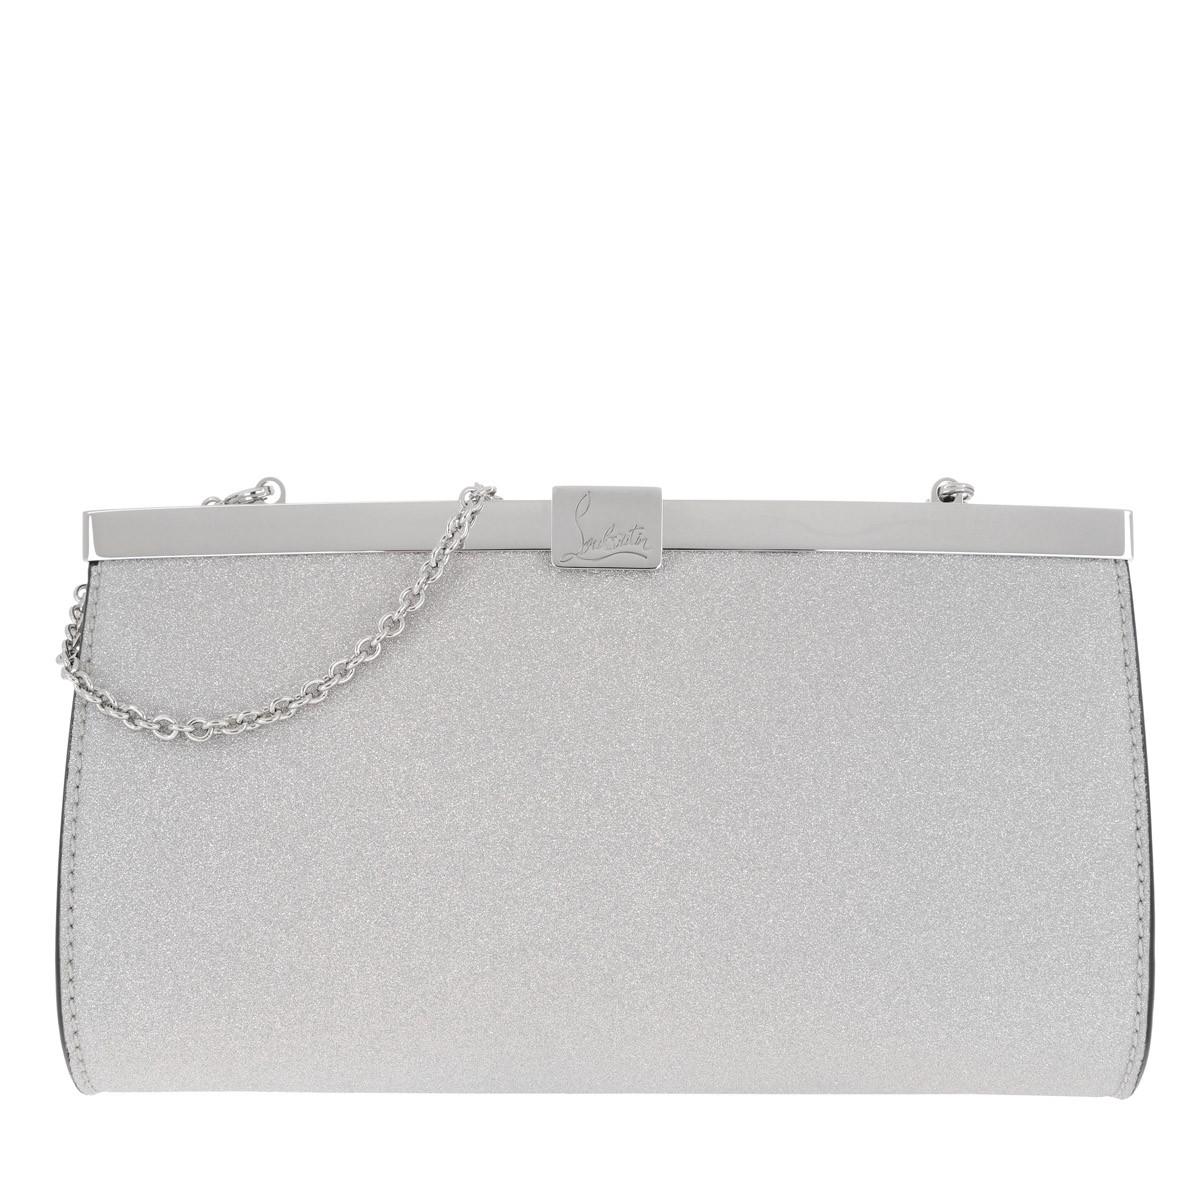 Christian Louboutin Clutch - Palmette Clutch Small Silver - in silber - für Damen